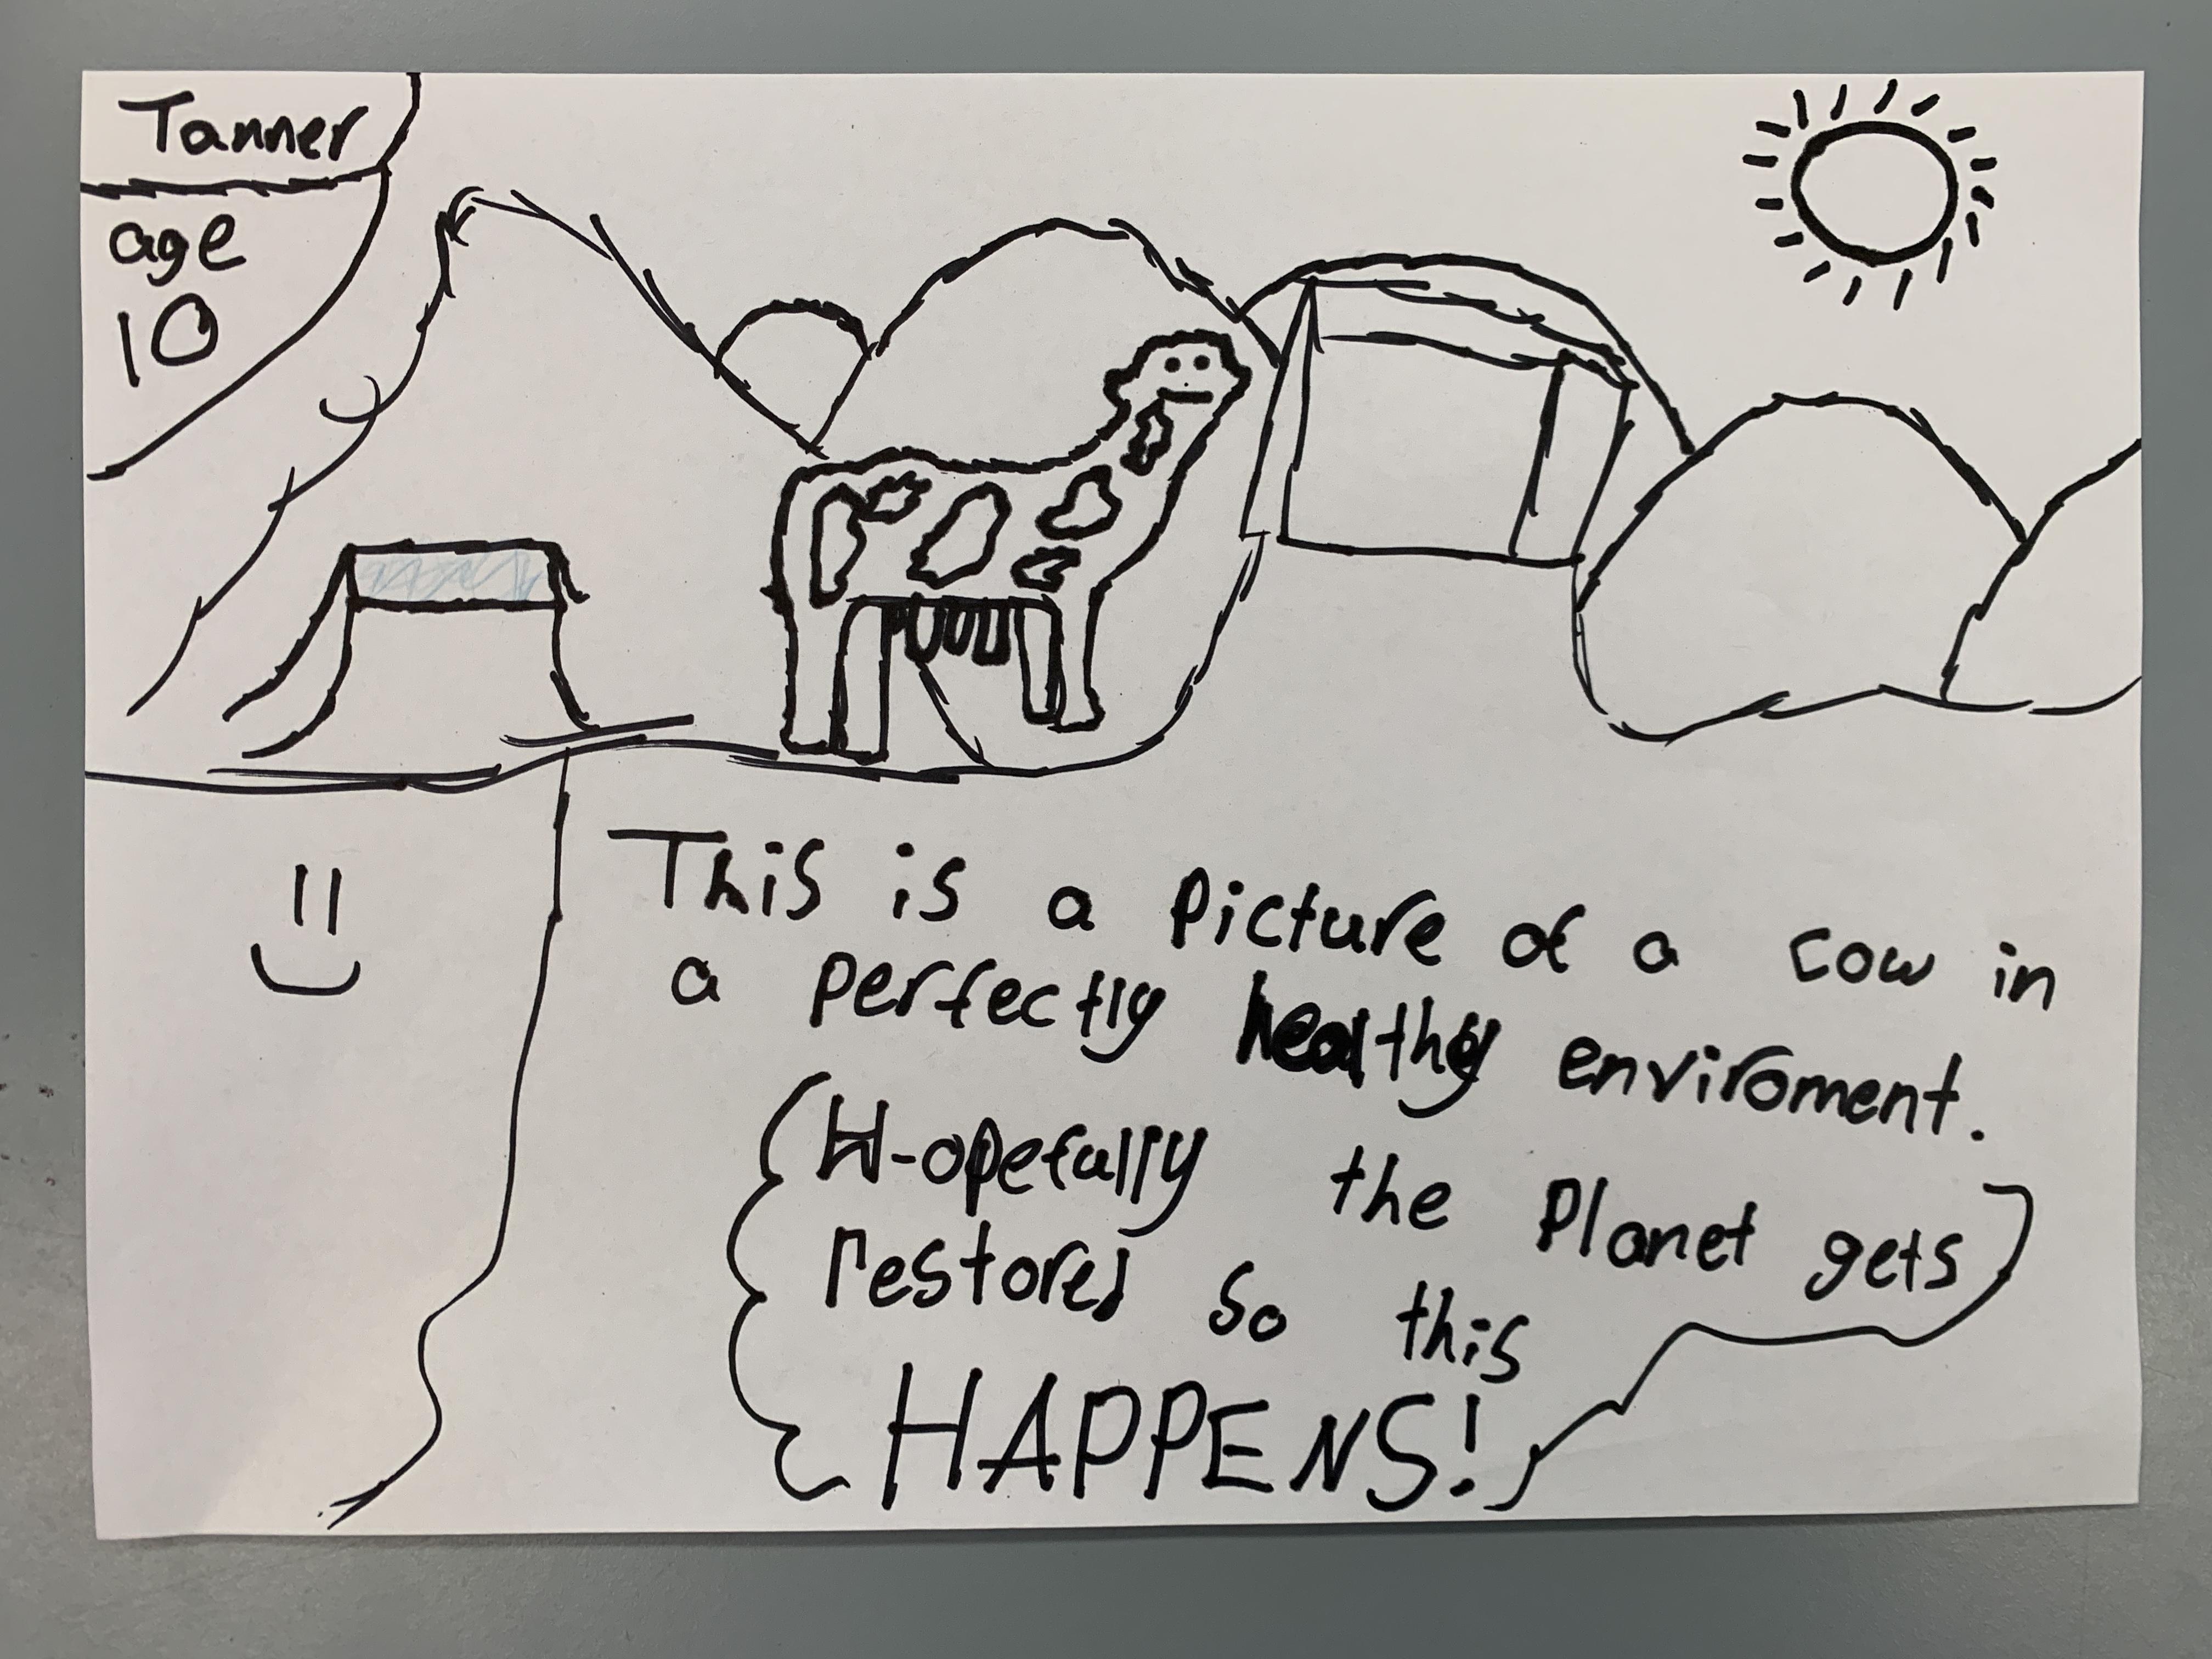 12. healthy environment